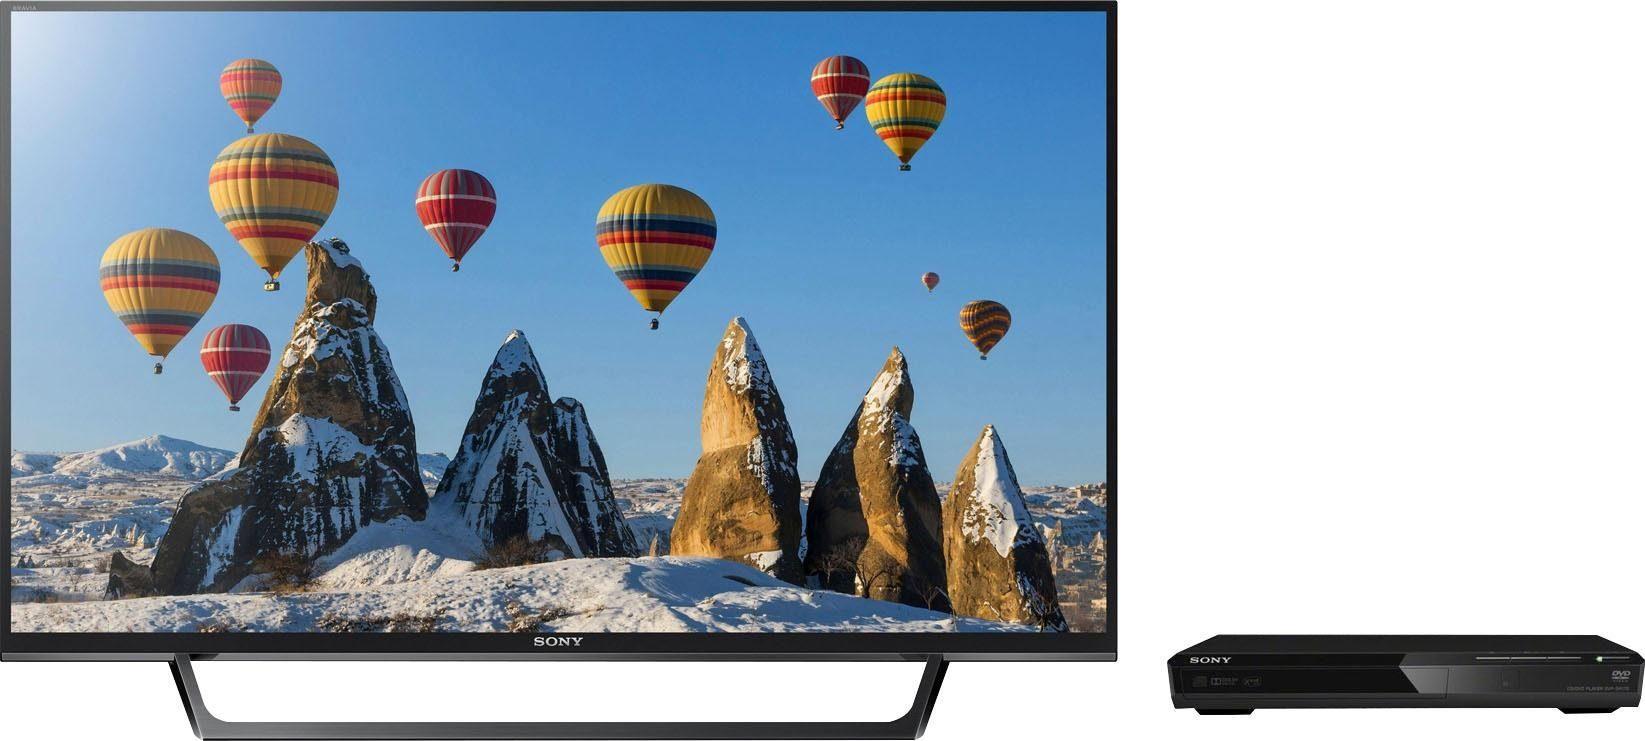 Sony KDL40RE455BAEP LED-Fernseher (101 cm/40 Zoll, Full HD, Spar-Set mit DVD-Player DVP-SR170B)